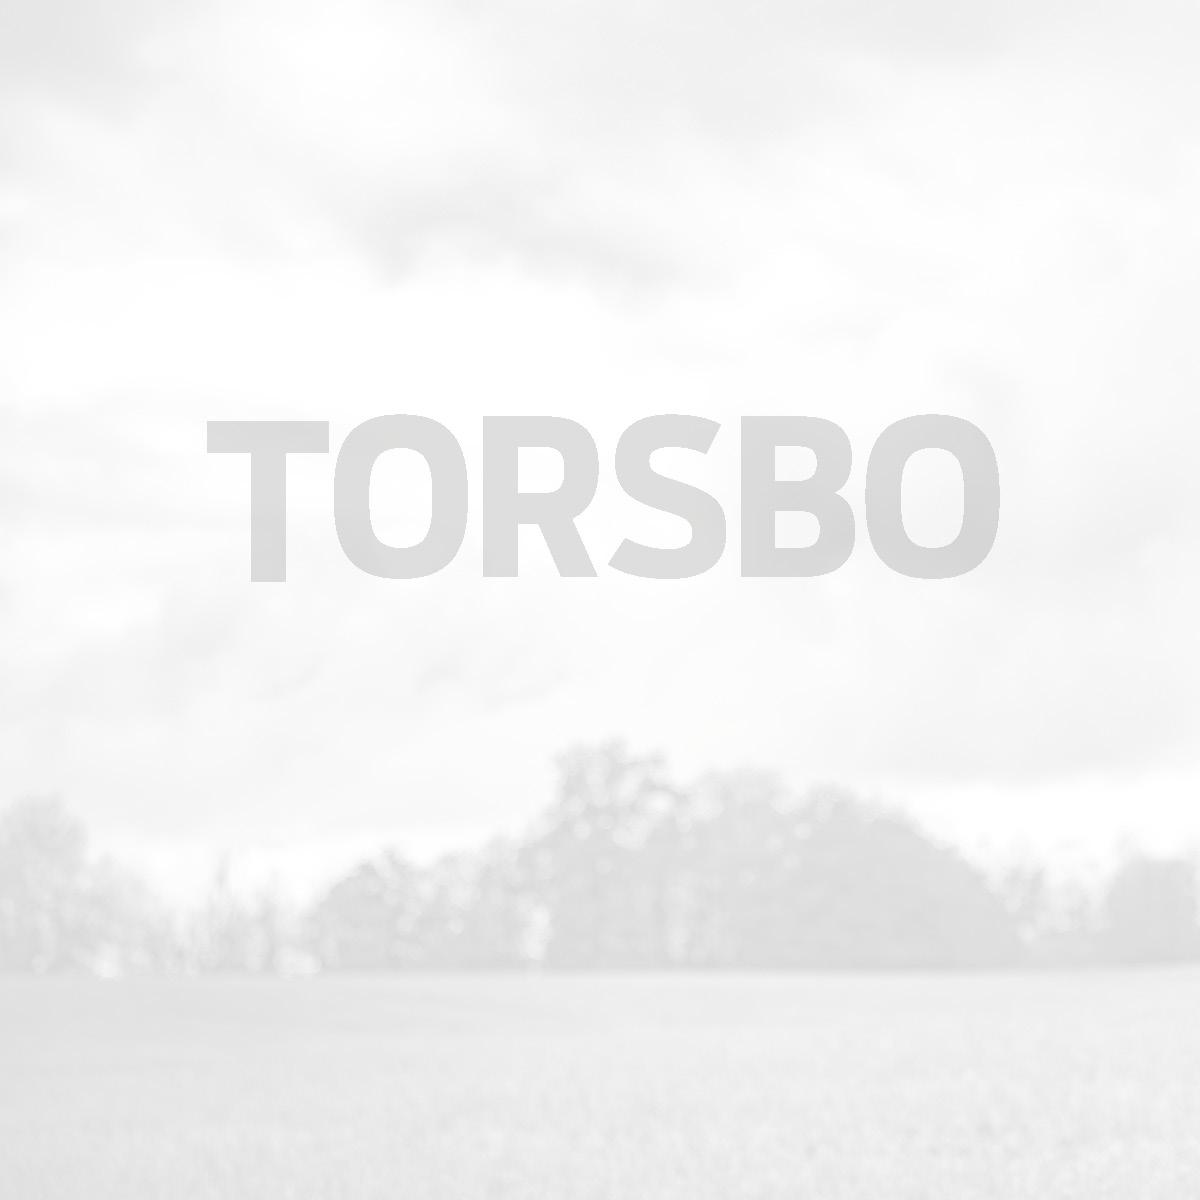 Barnes .308 Win TTSX BT Vor-Tx Euro